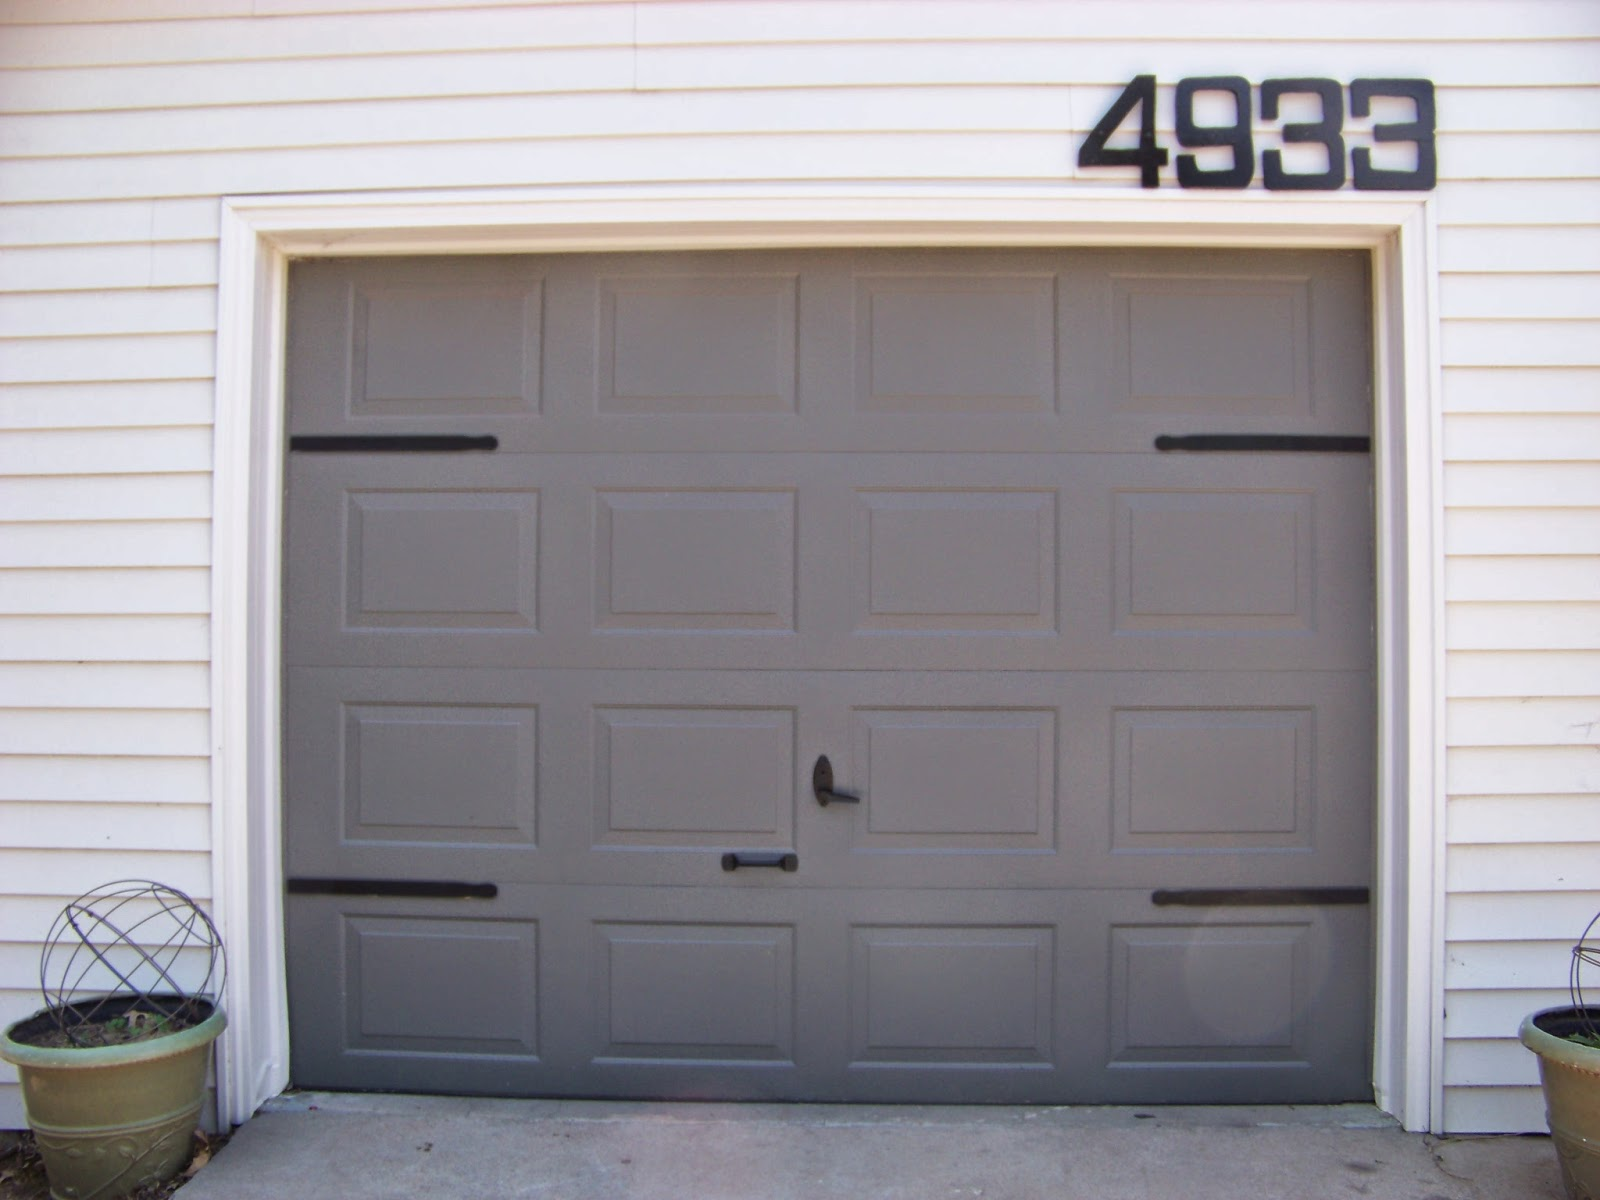 Carriage garage doors diy Build In Entry Door 5 Diy Garage Door Update Faux Hinges Using Paint Stir Sticks The Sunset Lane Remodelaholic Remodelaholic Diy Garage Door Updates